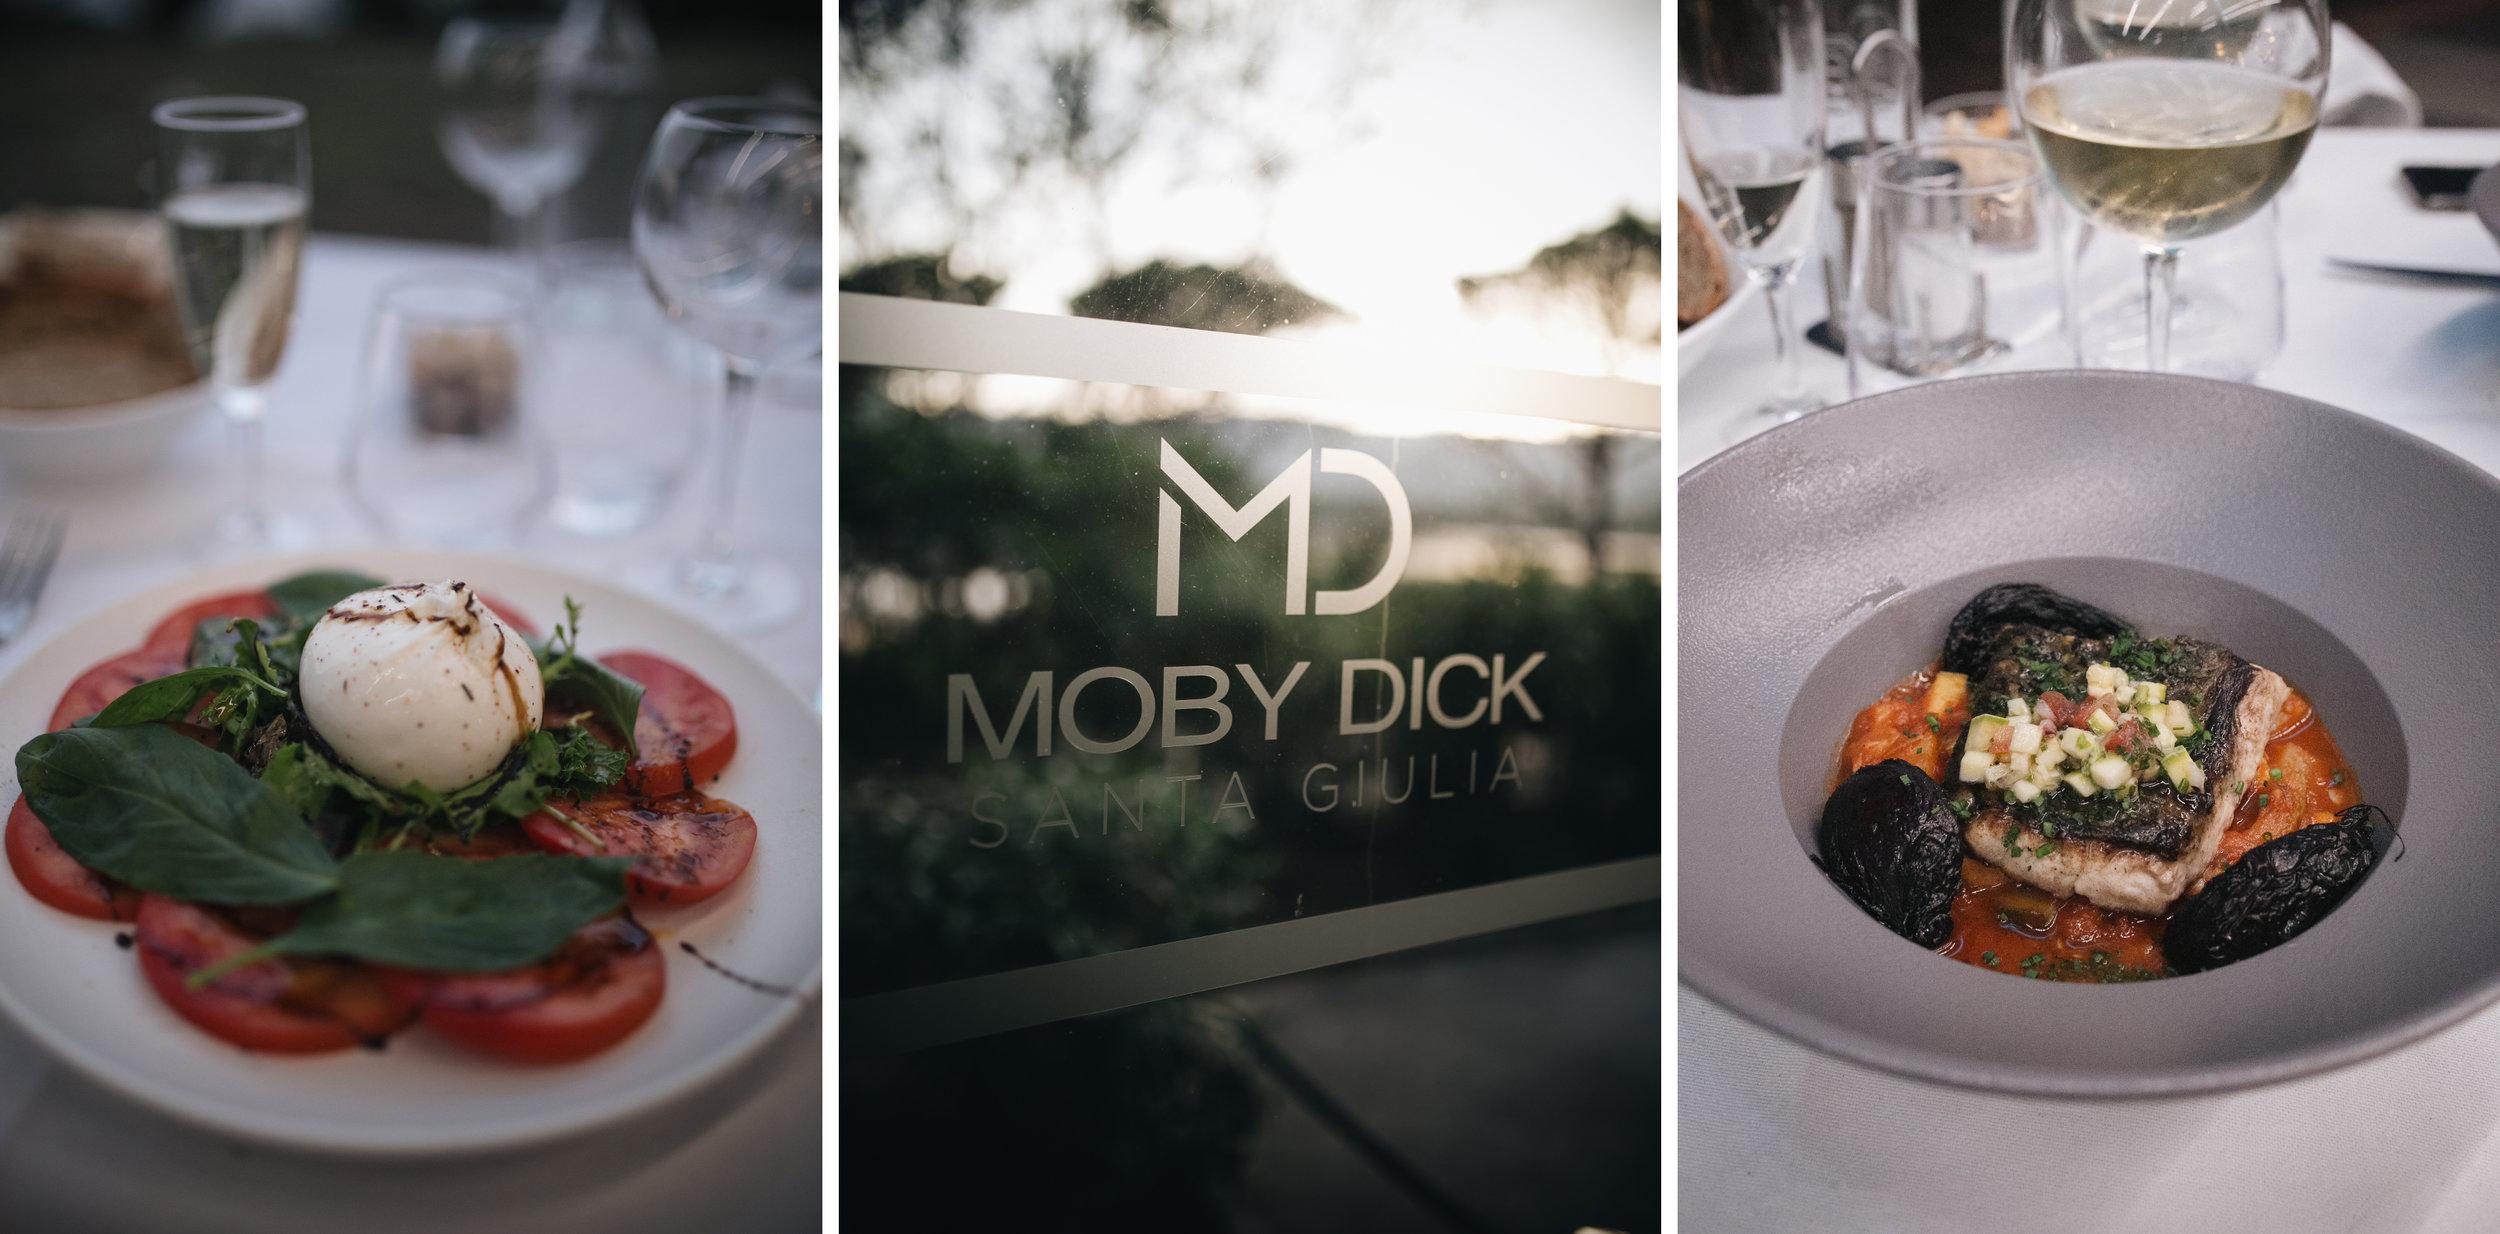 la-table-de-moby-dick-santa-giulia-restaurant-porto-vecchio.jpg